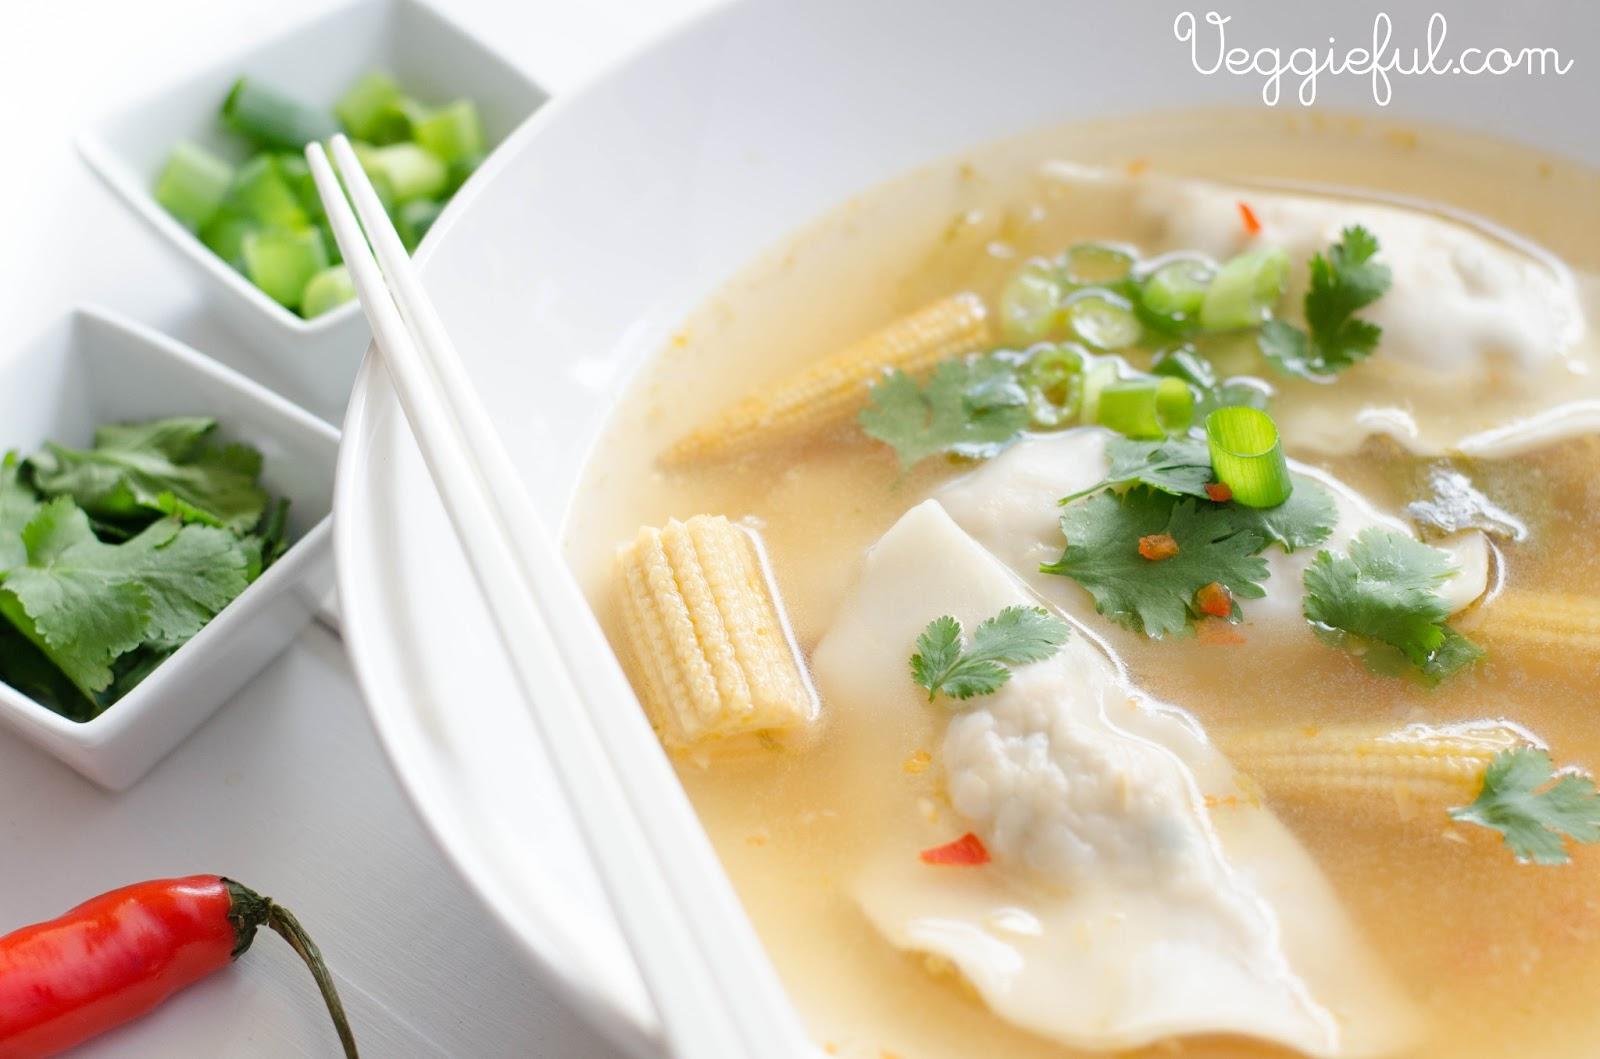 VeggiefulVegan Asian Dumpling Soup Recipe